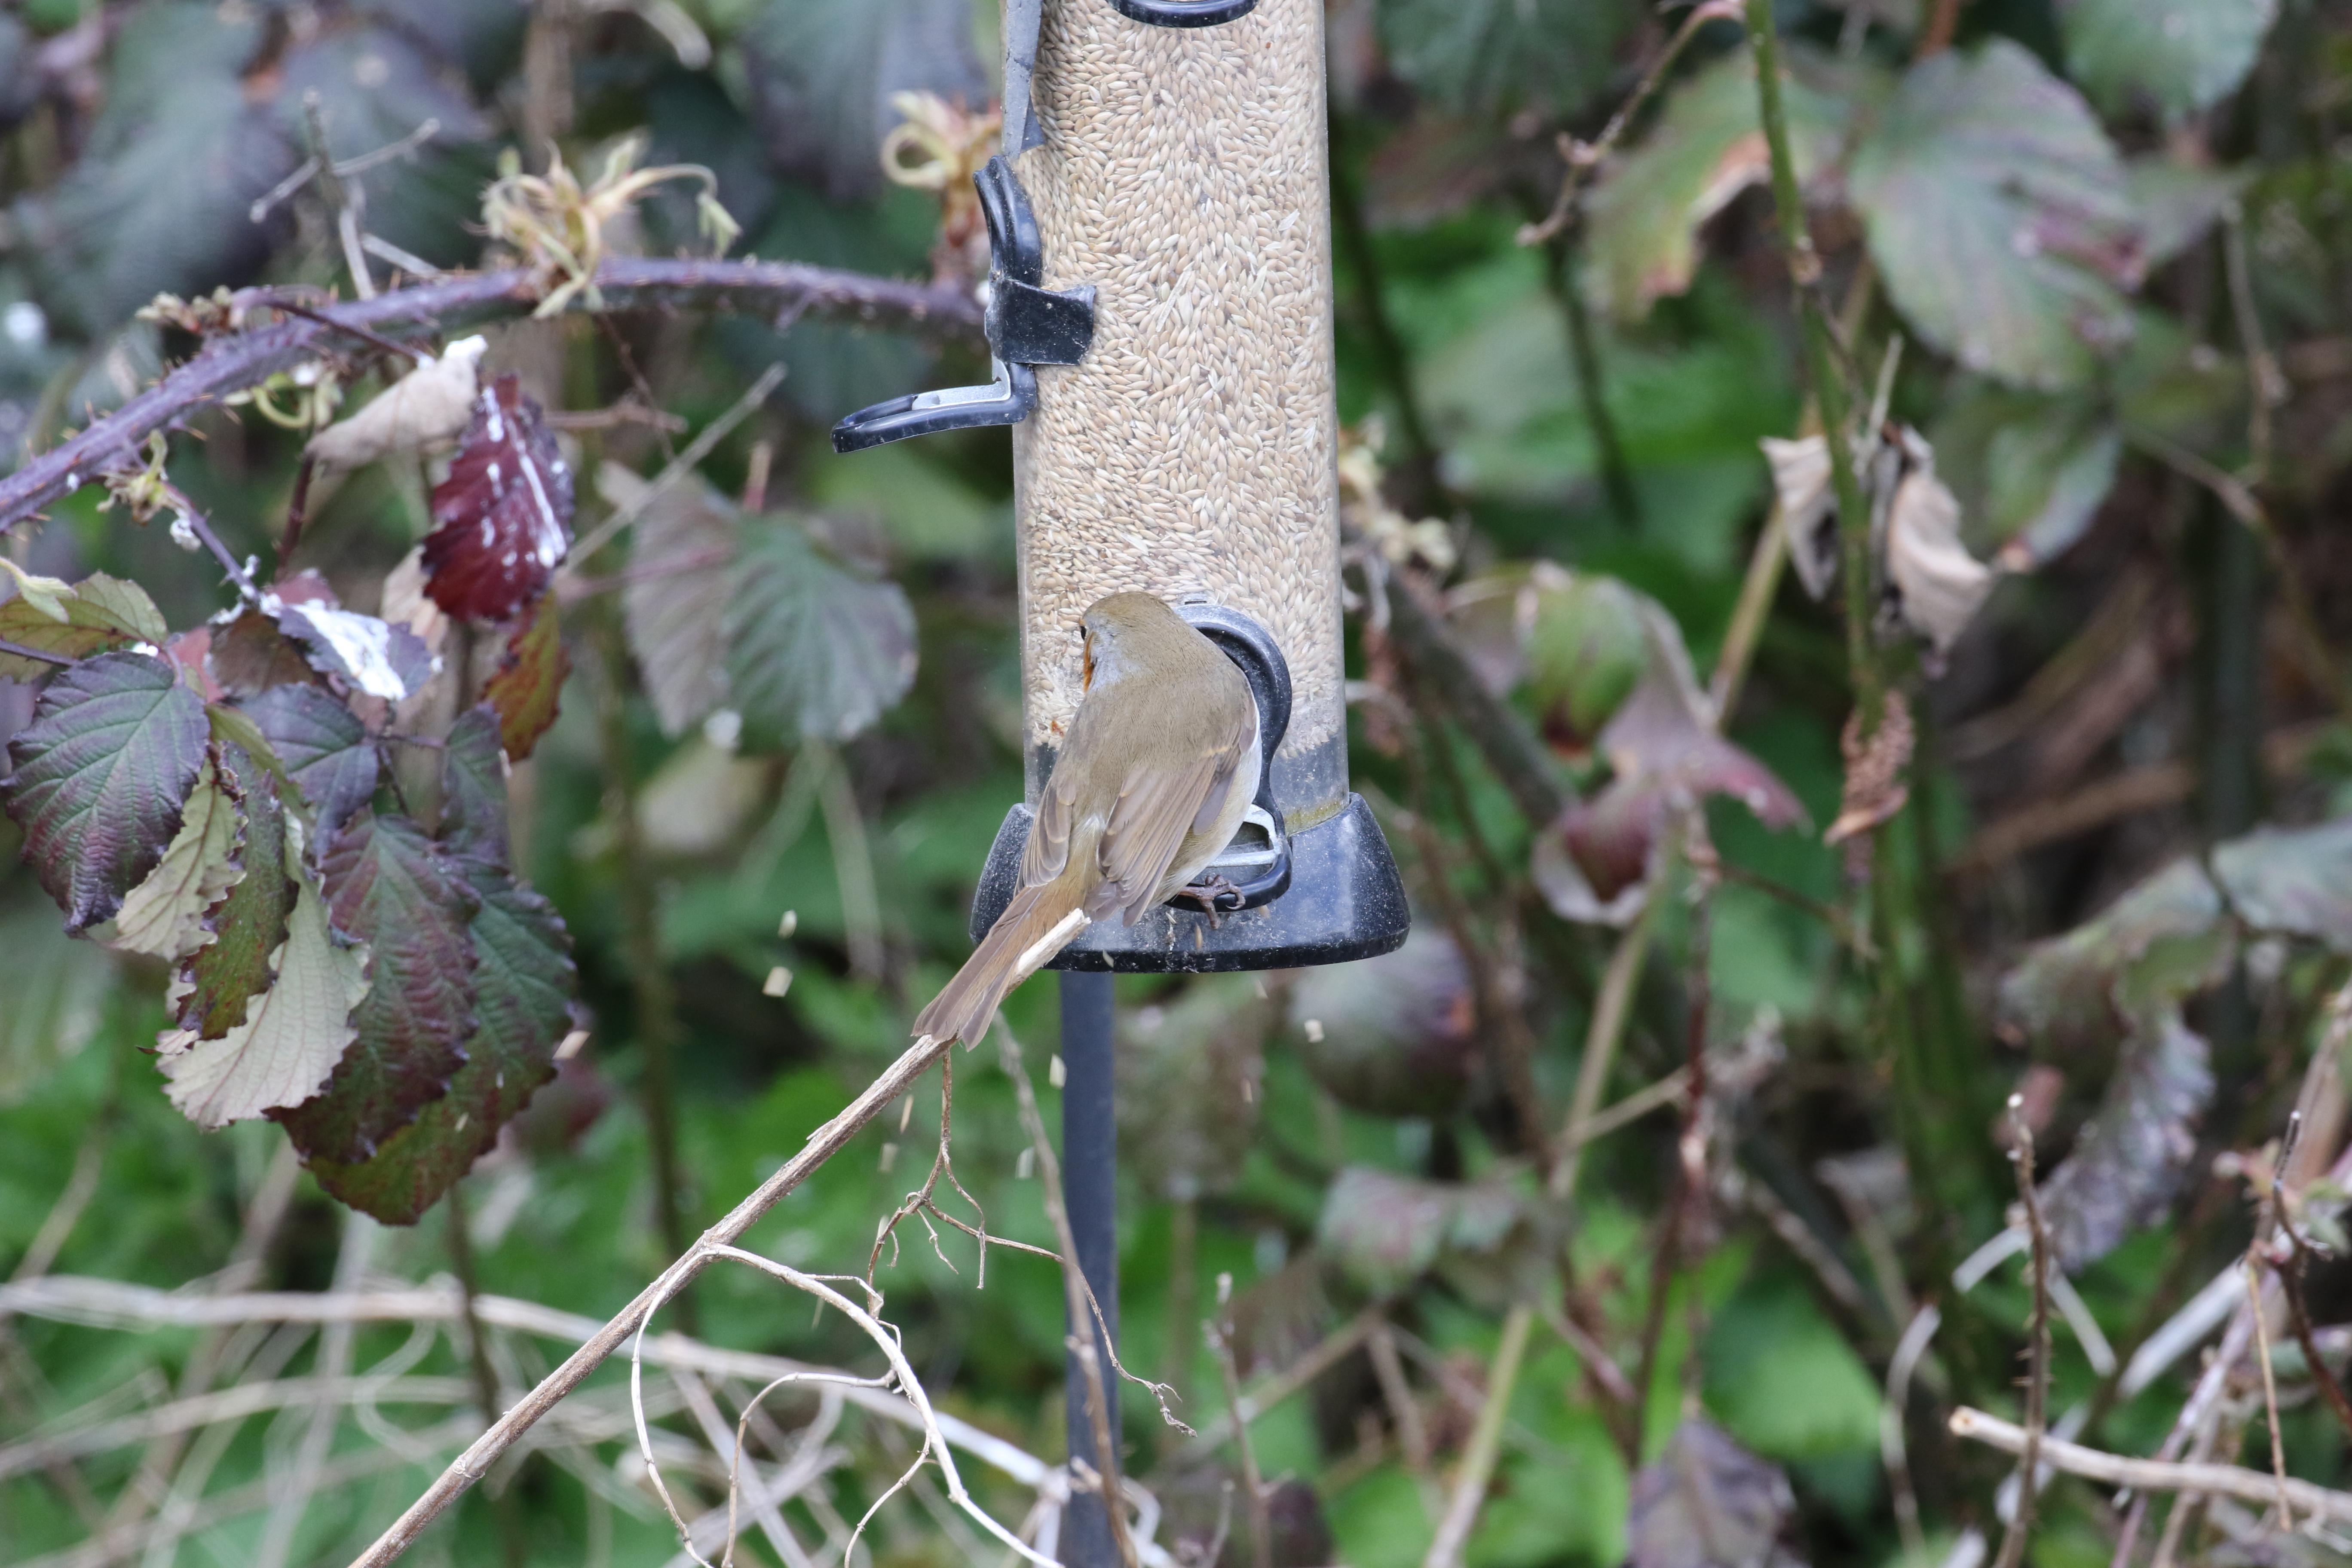 bbq the insect seed sunflower gardener centre eco insects keen chapelwood online feeders bird habitats feeder garden